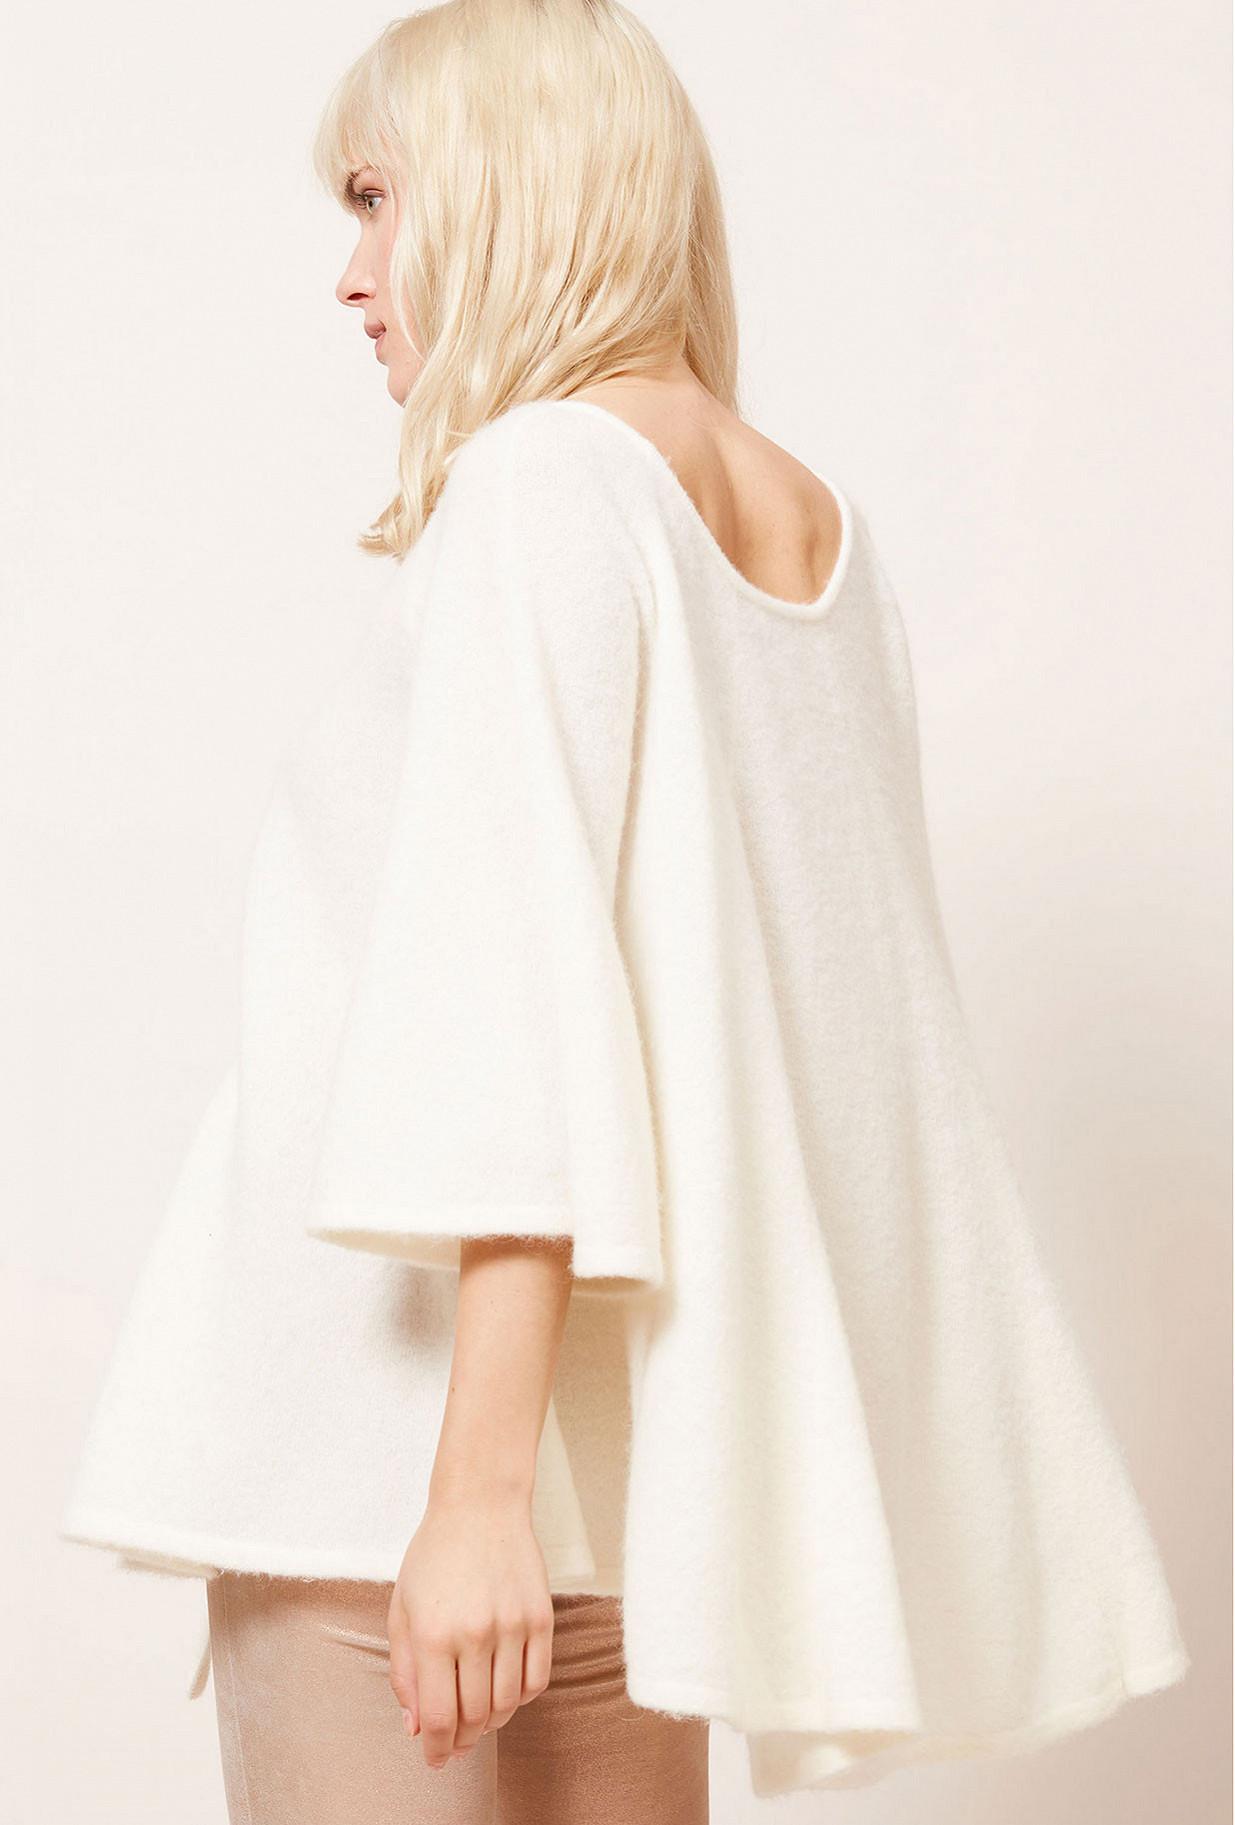 Ivory Sweater Pampa Mes Demoiselles Paris